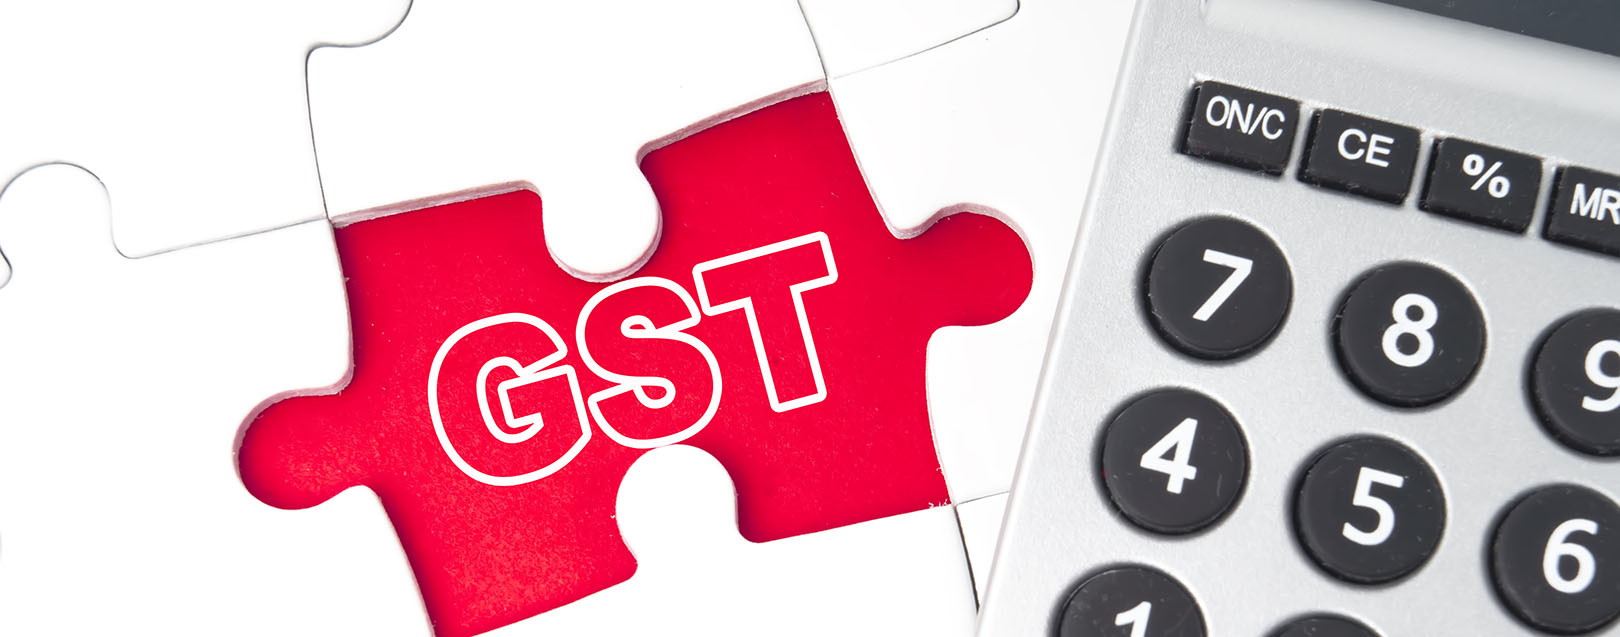 GST Law model